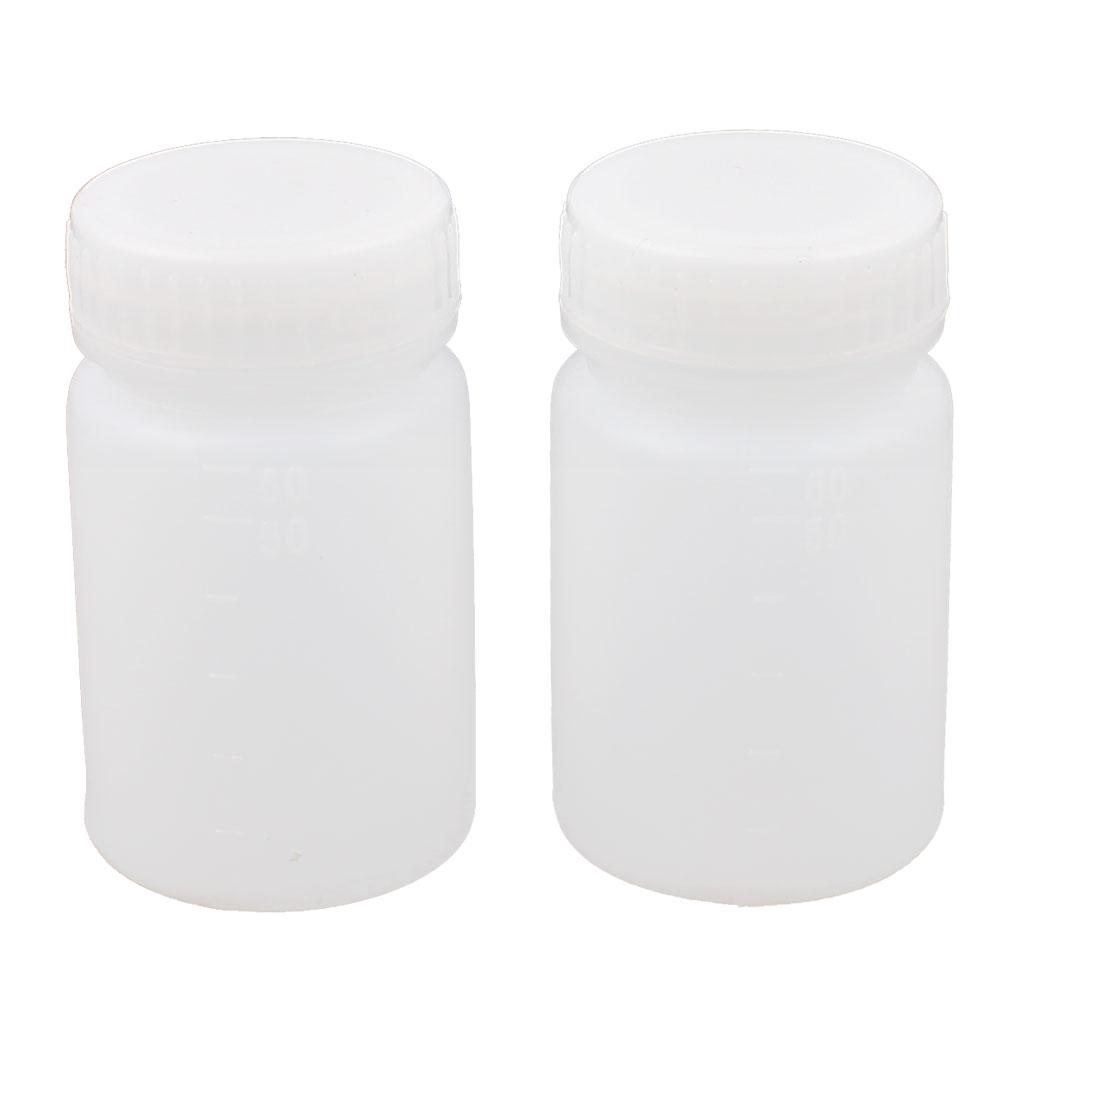 2 Pcs White Plastic Cylinder Body Double Cap Leakproof Liquid Laboratory Bottle